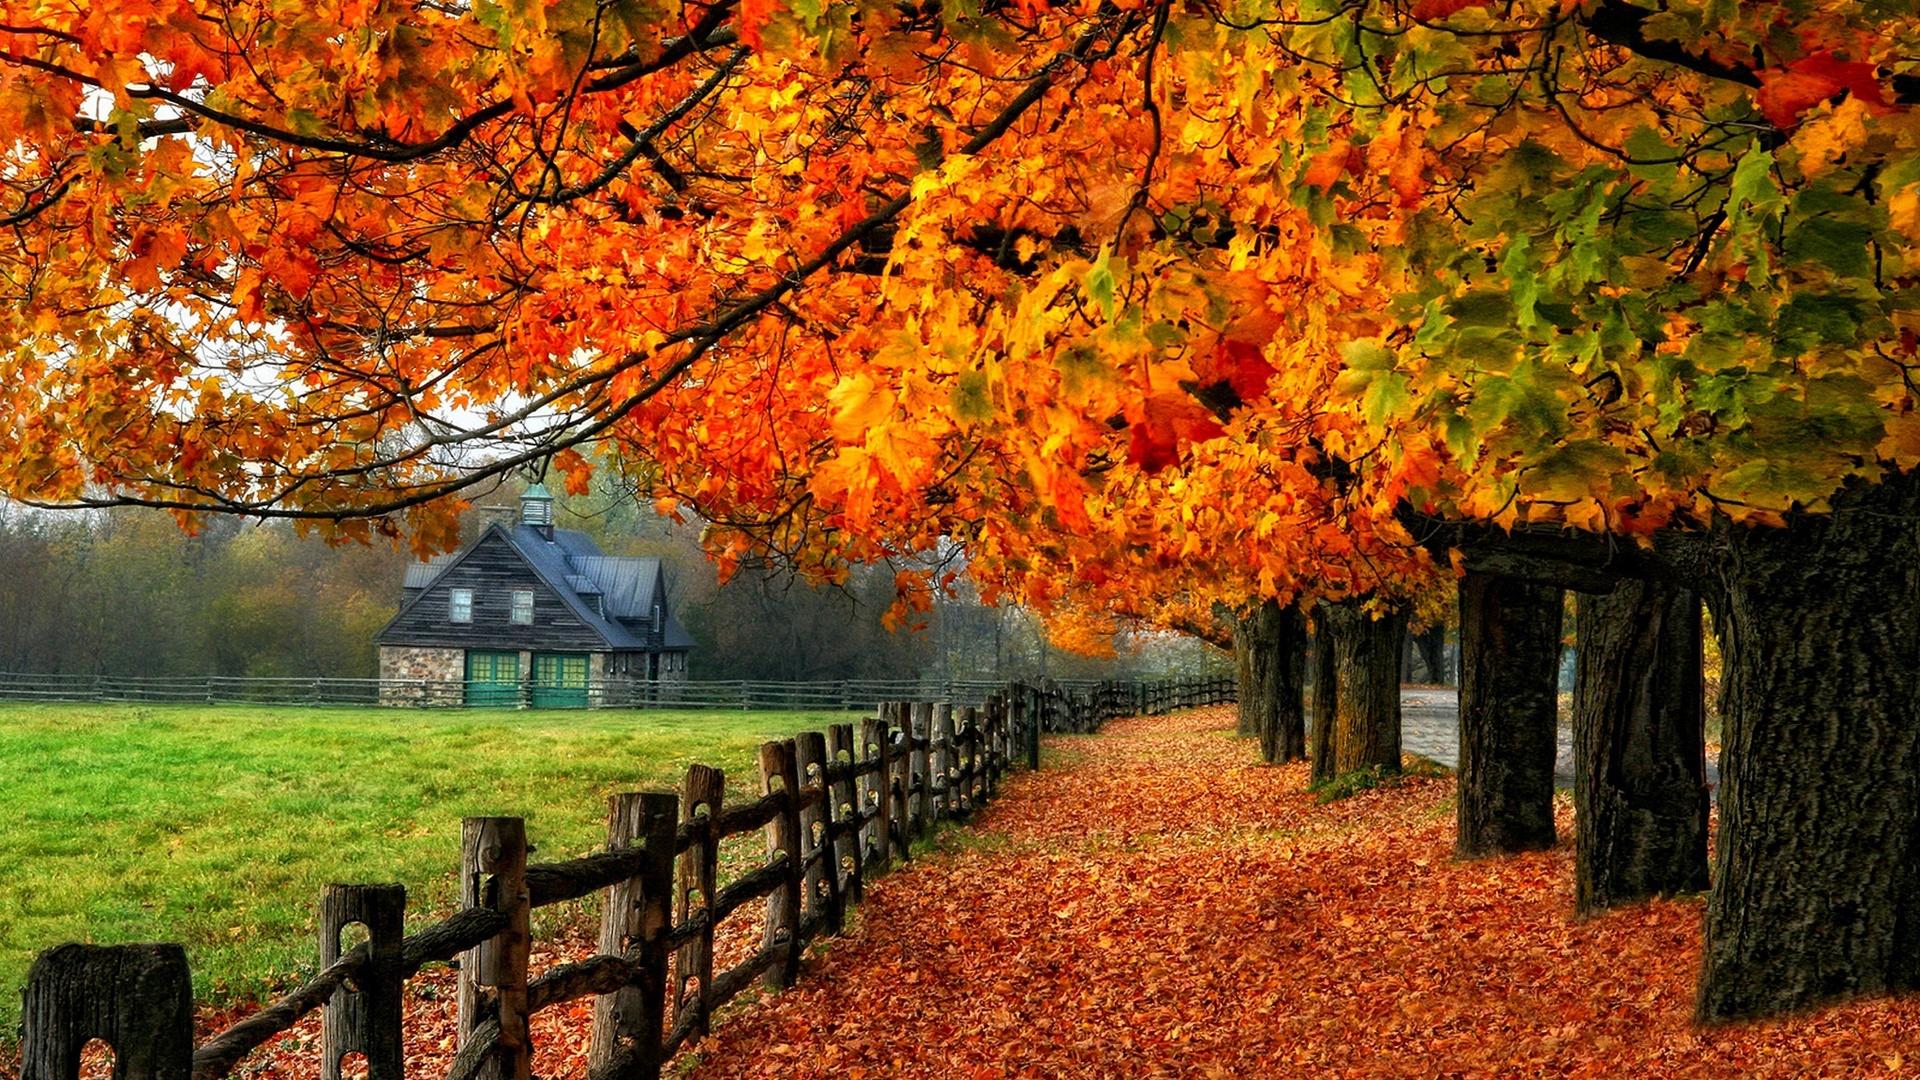 Hd wallpaper download 4k - Bunter Herbst Rote Bl 228 Tter Pfad Gras Haus